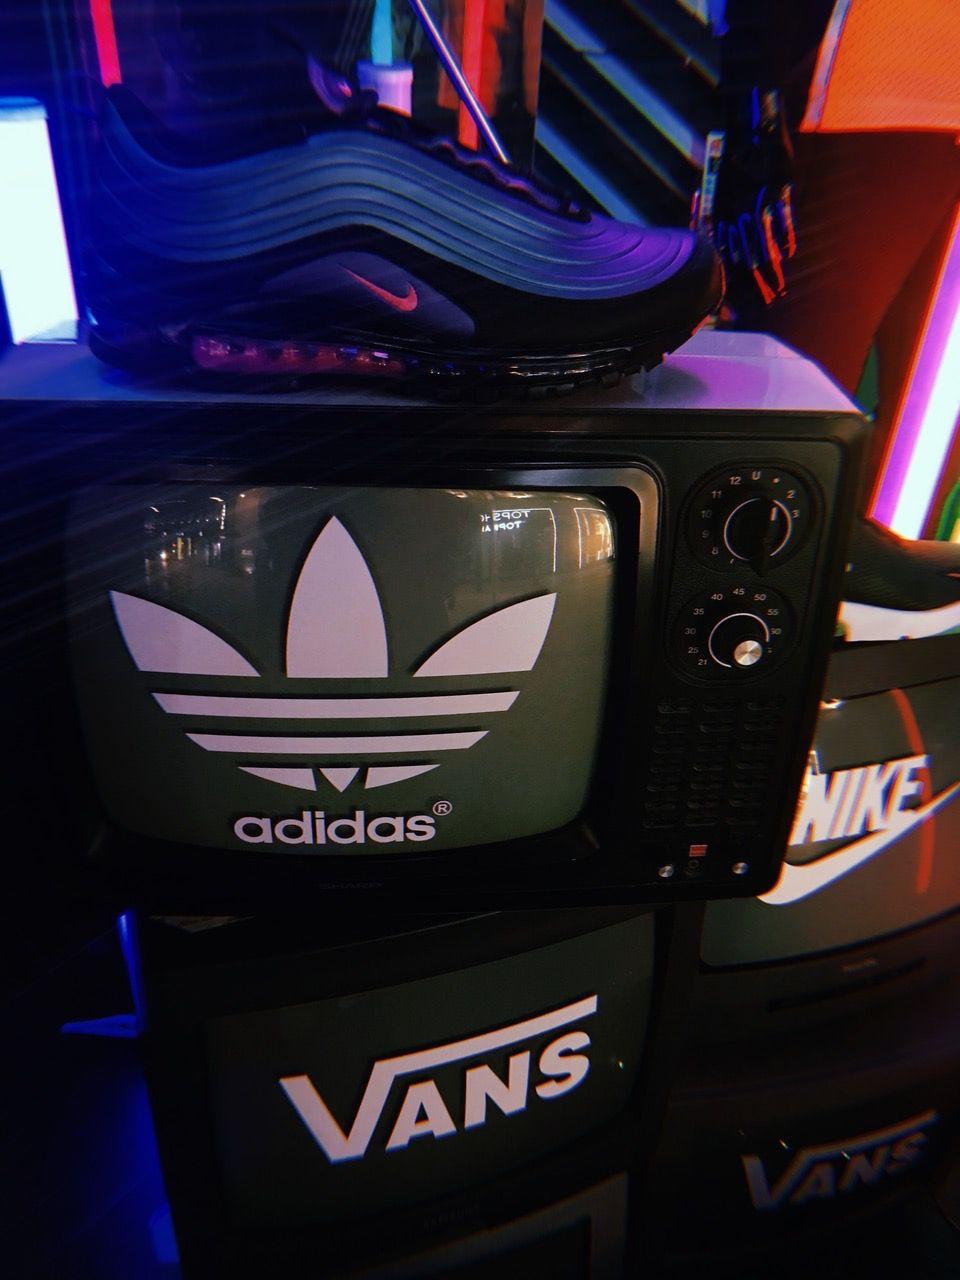 adidas #clothes #brand #fashion | Adidas official, Adidas